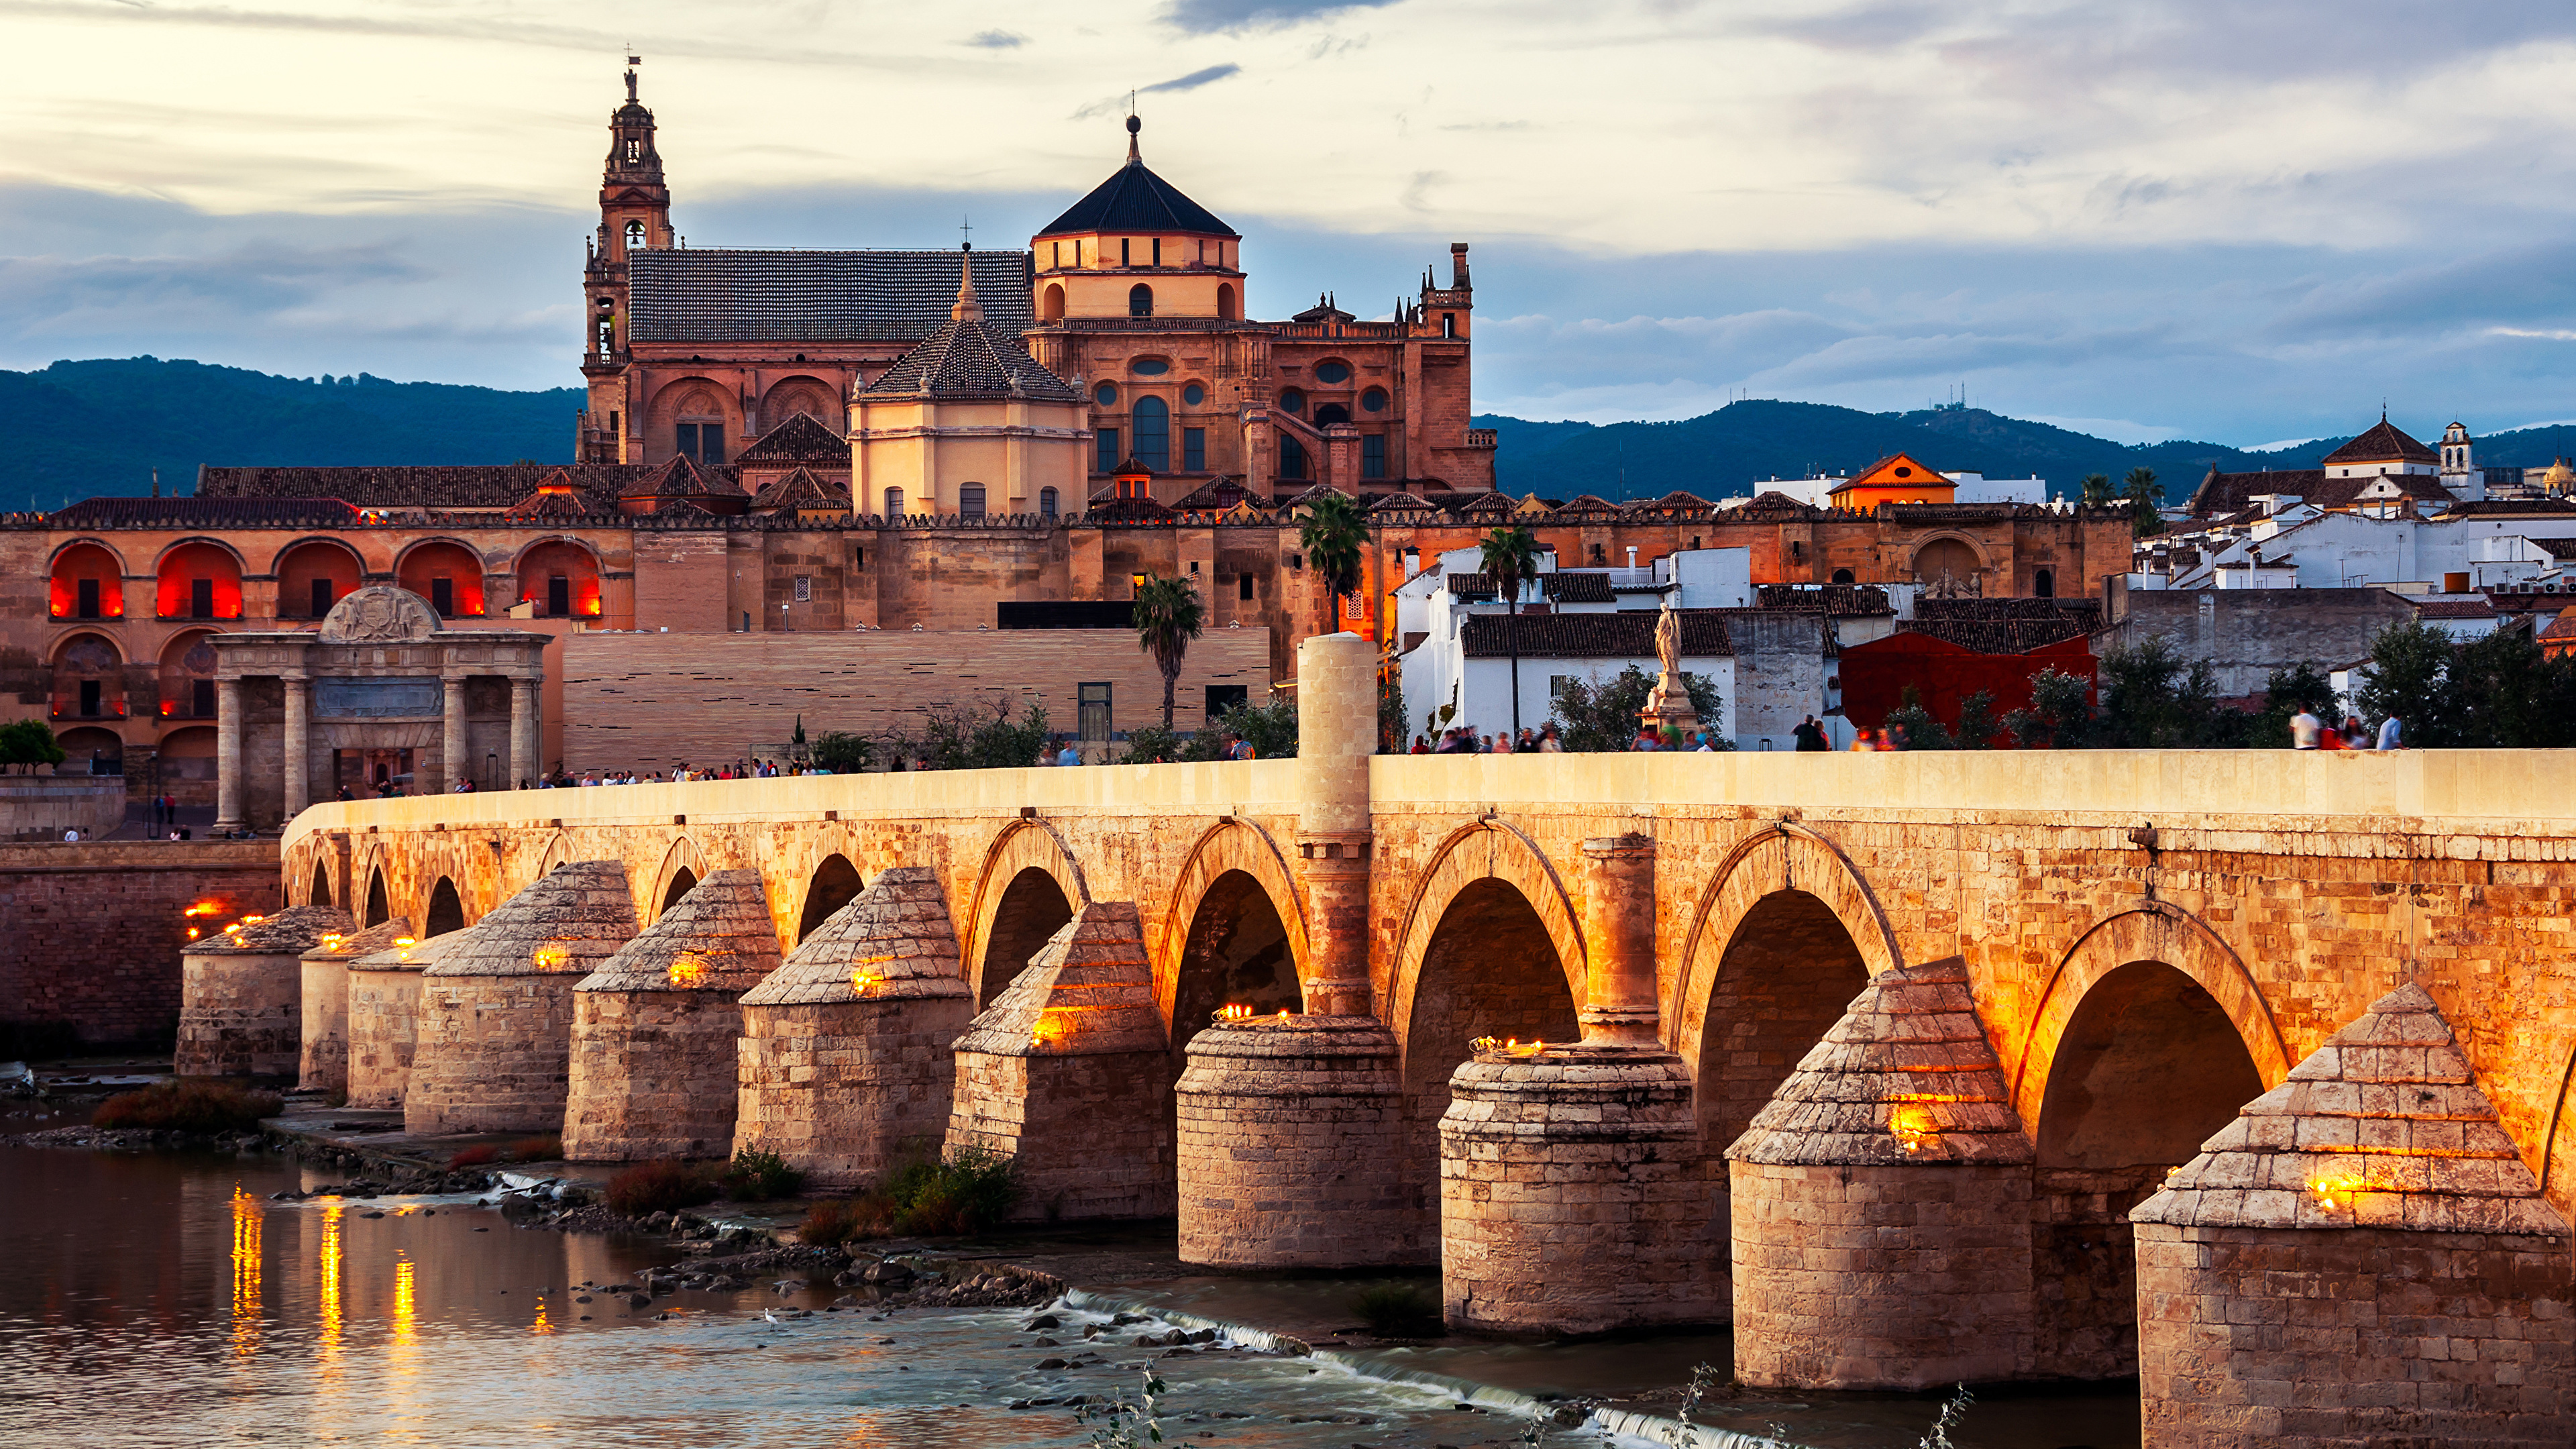 Desktop Wallpapers Spain Roman bridge Cordoba river Cities 3840x2160